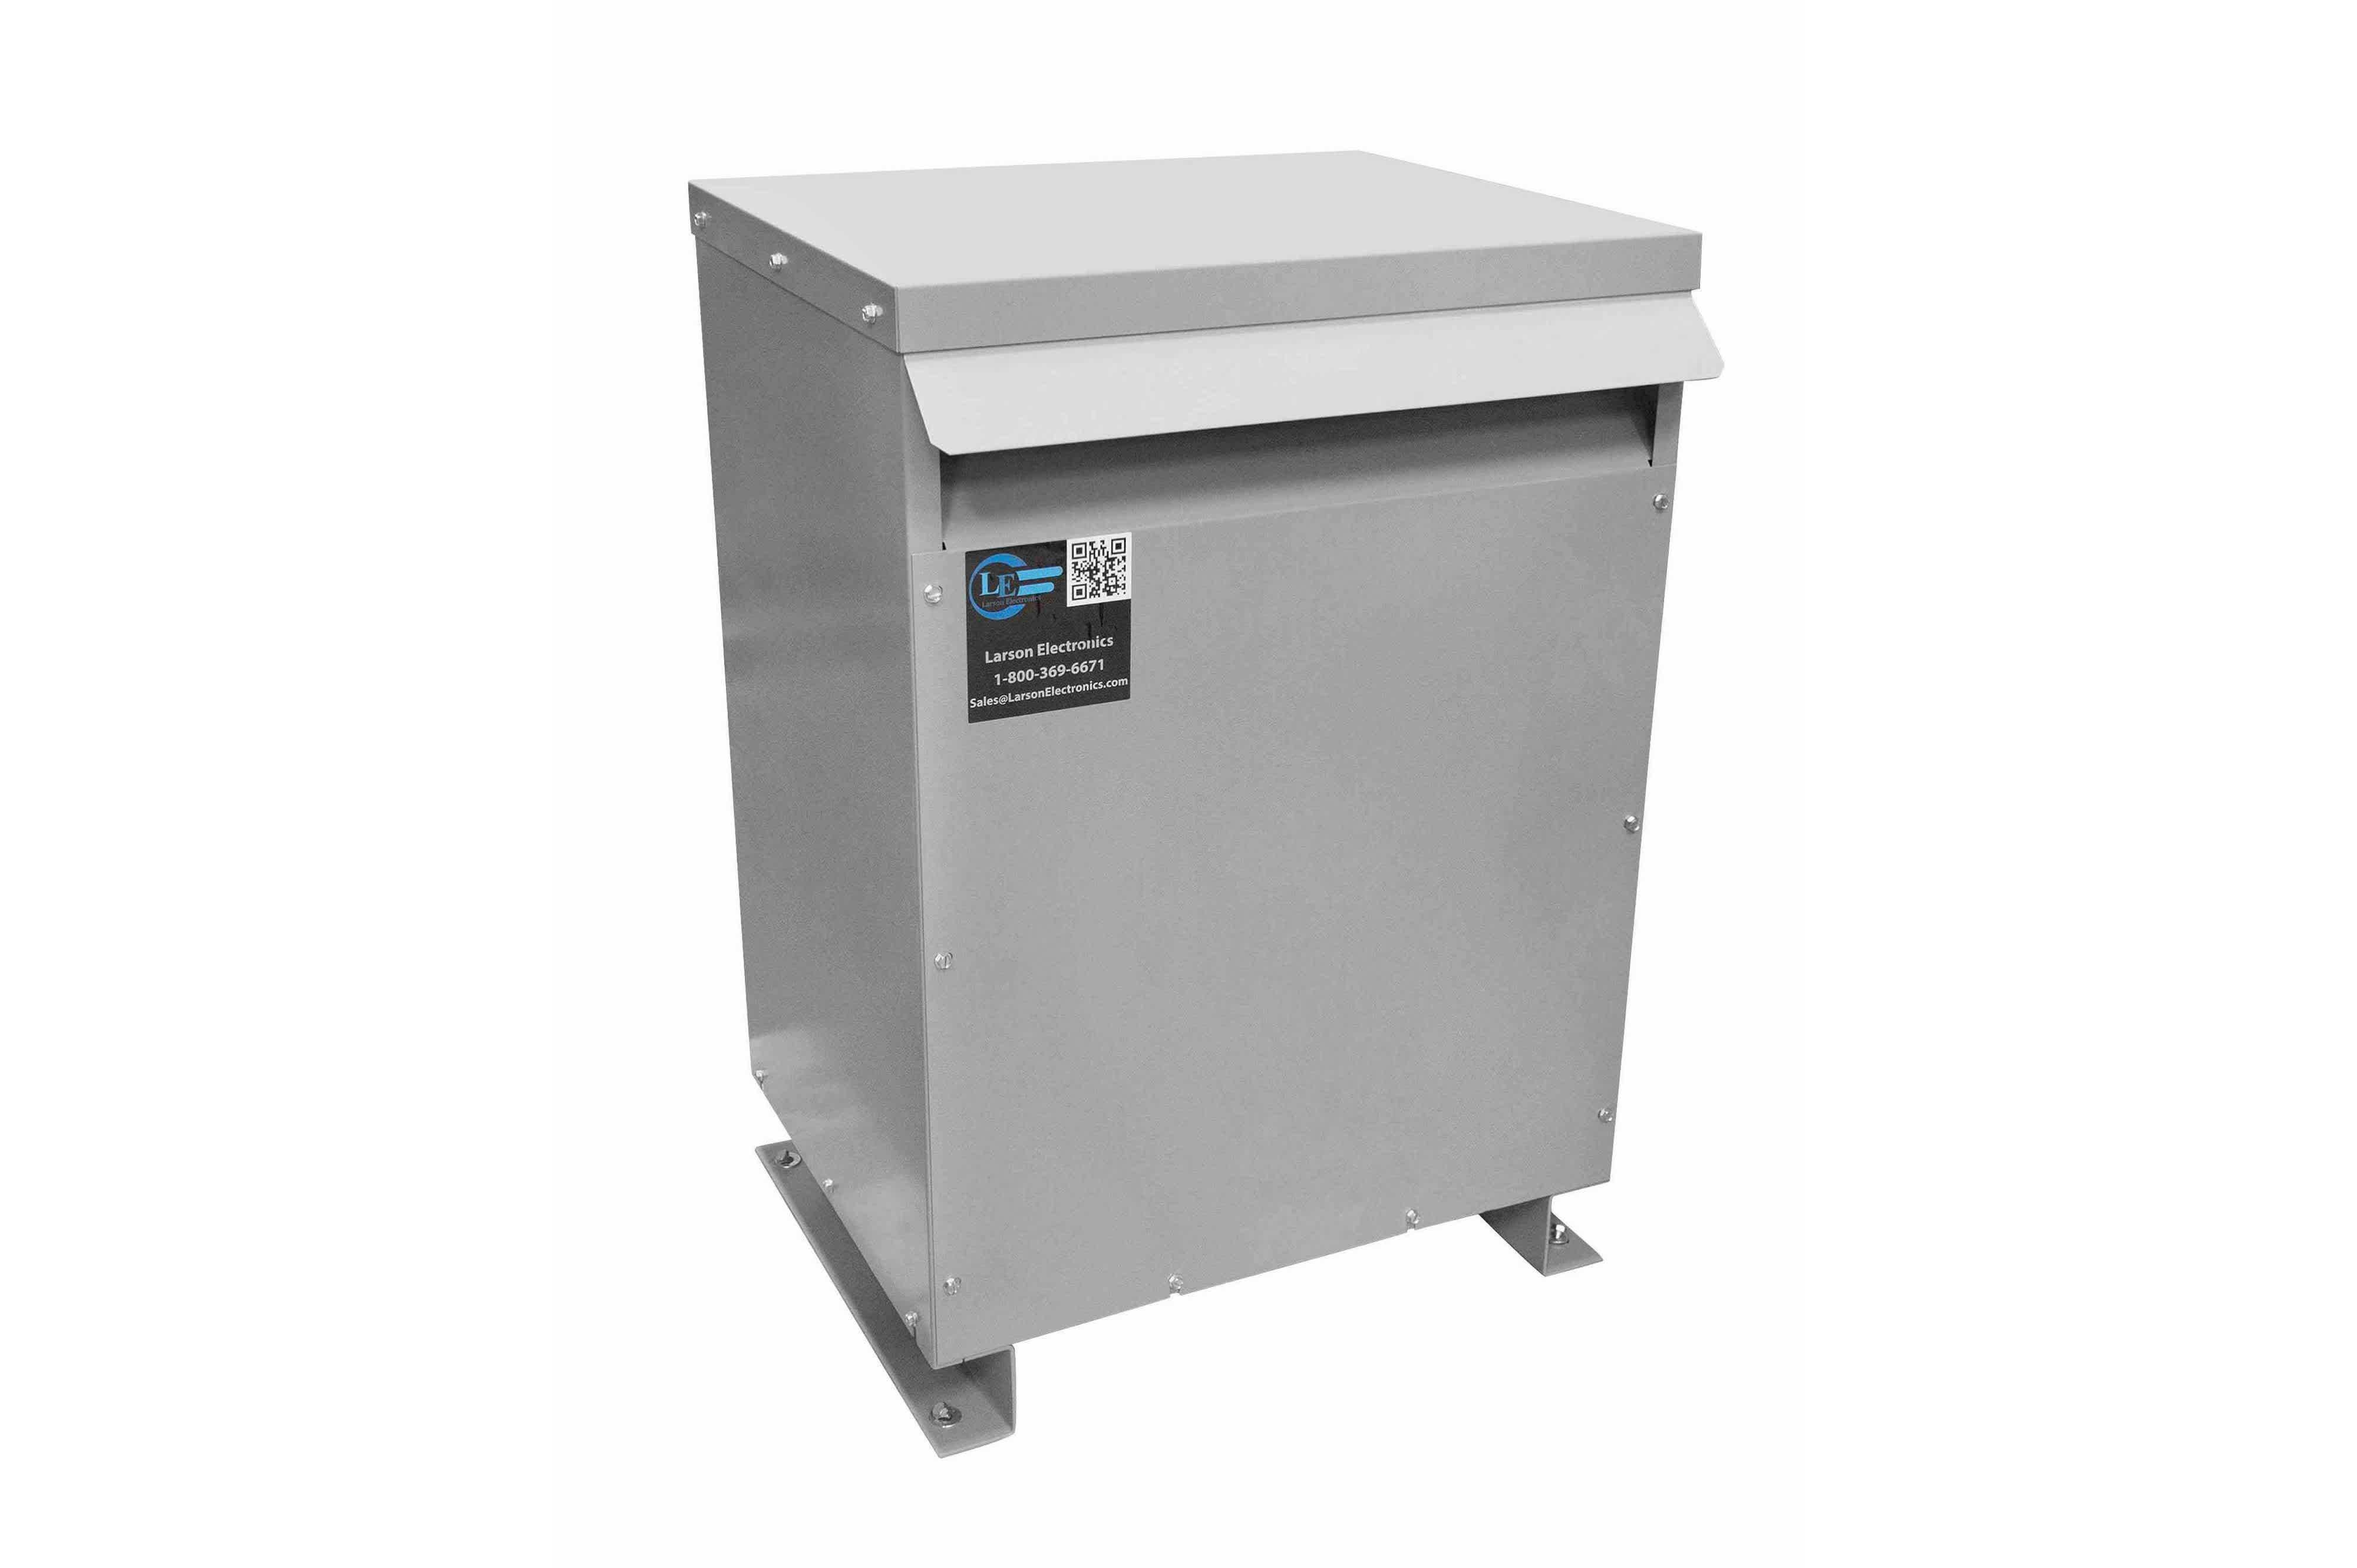 175 kVA 3PH Isolation Transformer, 480V Wye Primary, 380Y/220 Wye-N Secondary, N3R, Ventilated, 60 Hz